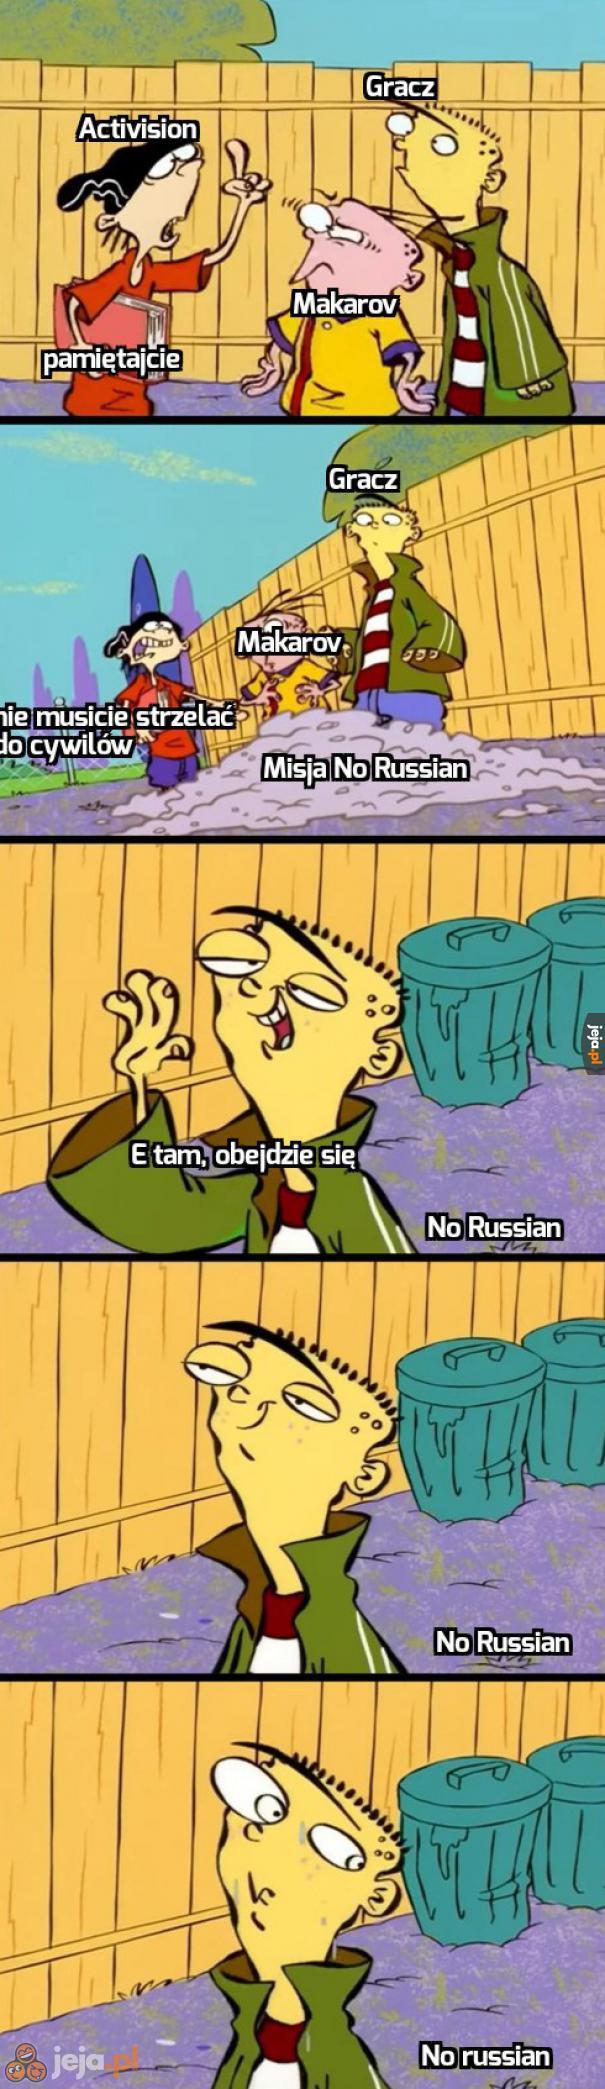 Pamiętasz tę misję?